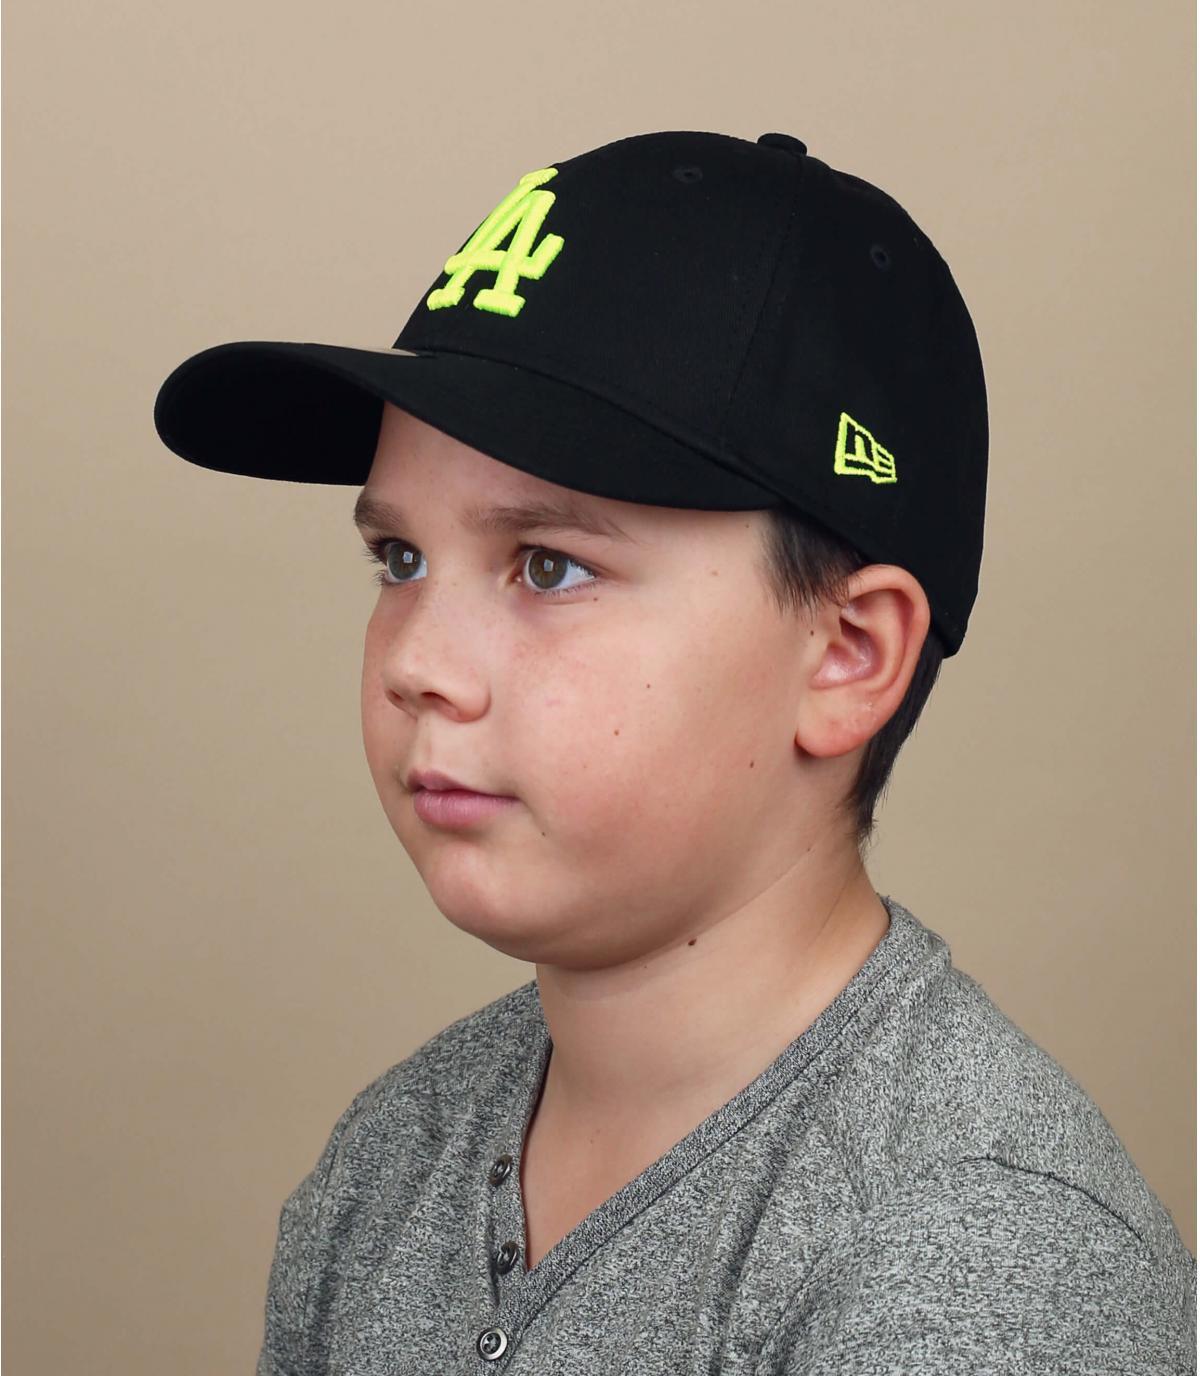 gorra infantil LA negro amarillo